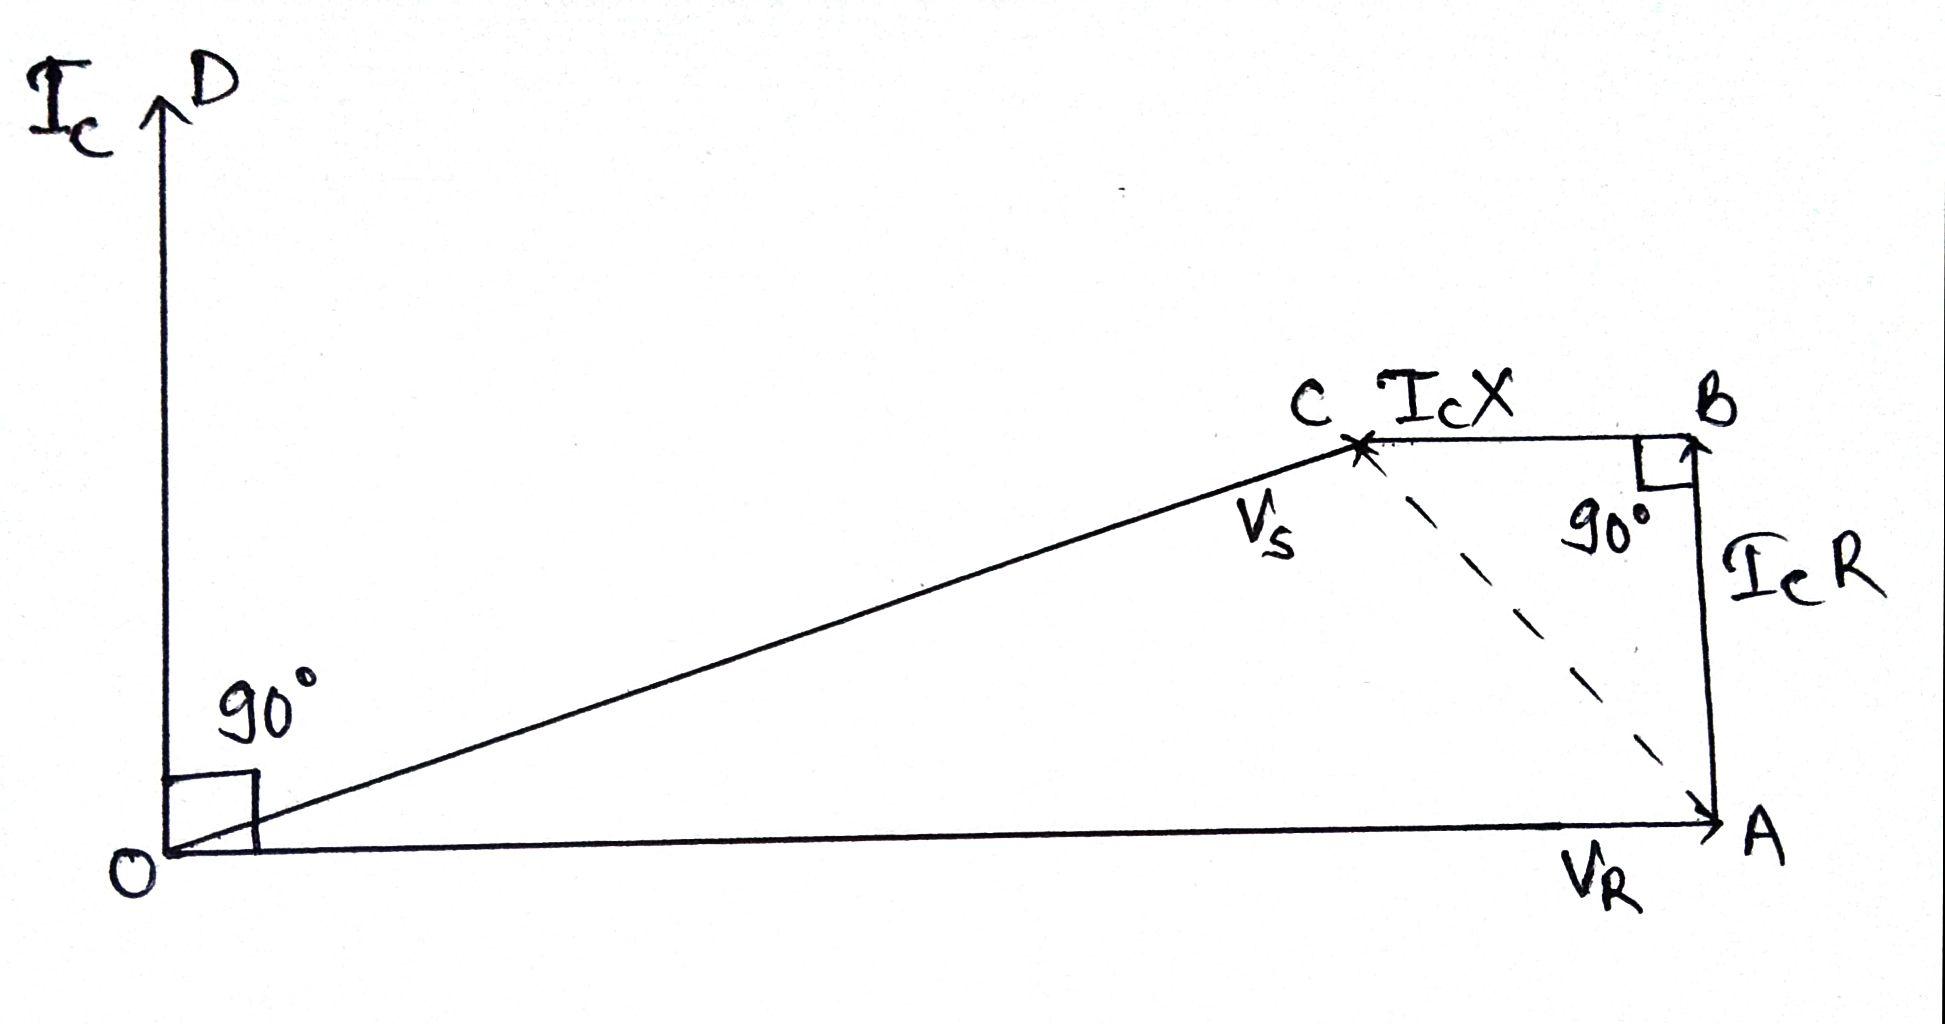 Phasor diagram of ferranti effect